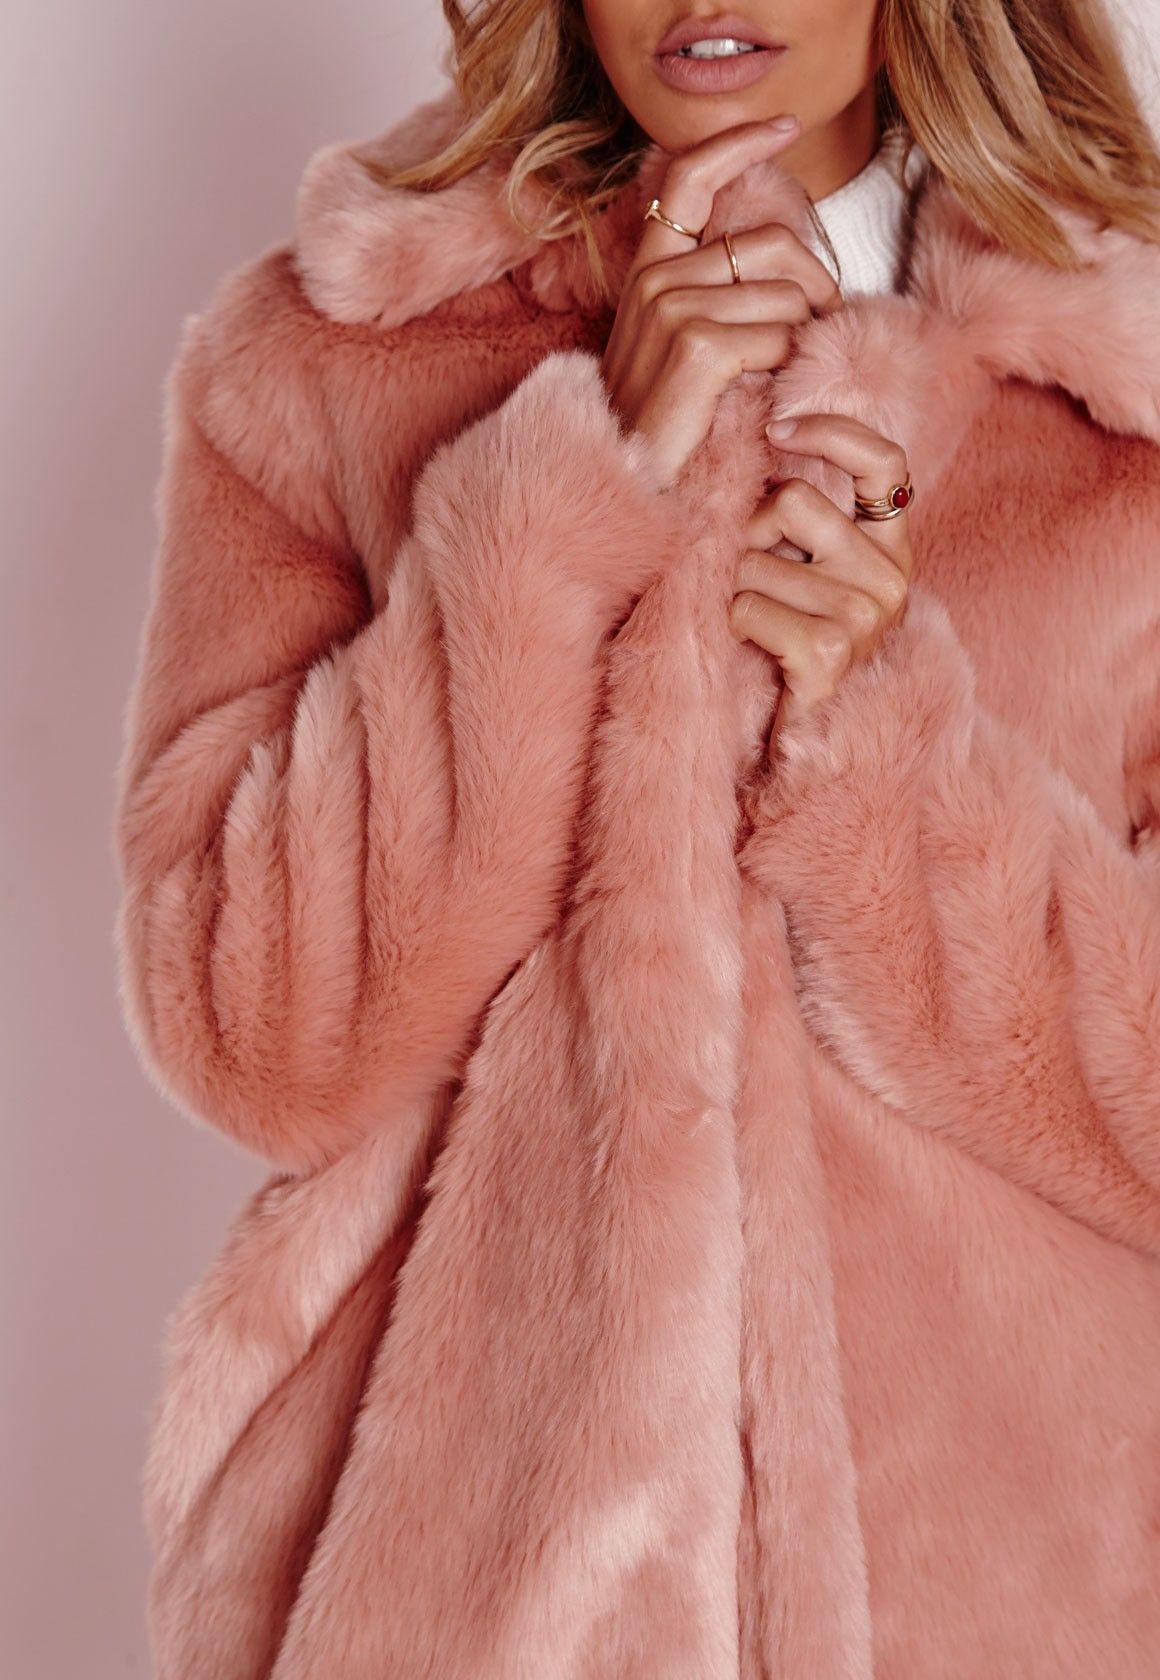 2eddb5f0a73c Missguided - Longline Faux Fur Coat Pink | Outfits | Pink faux fur ...